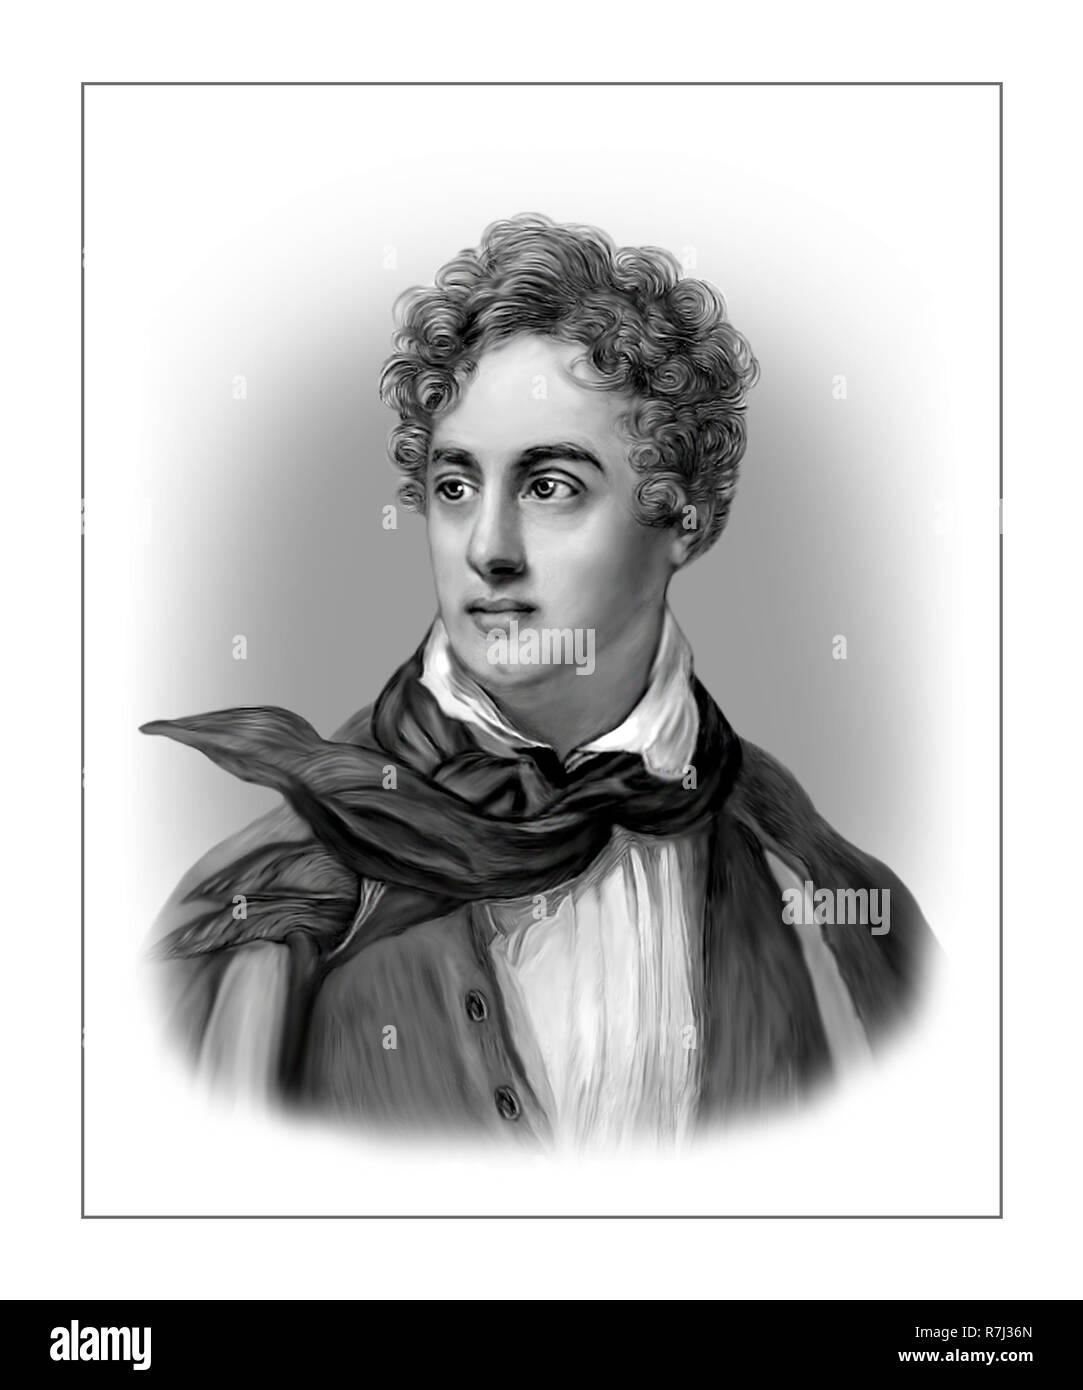 Lord Byron  1788 - 1824  English Poet - Stock Image